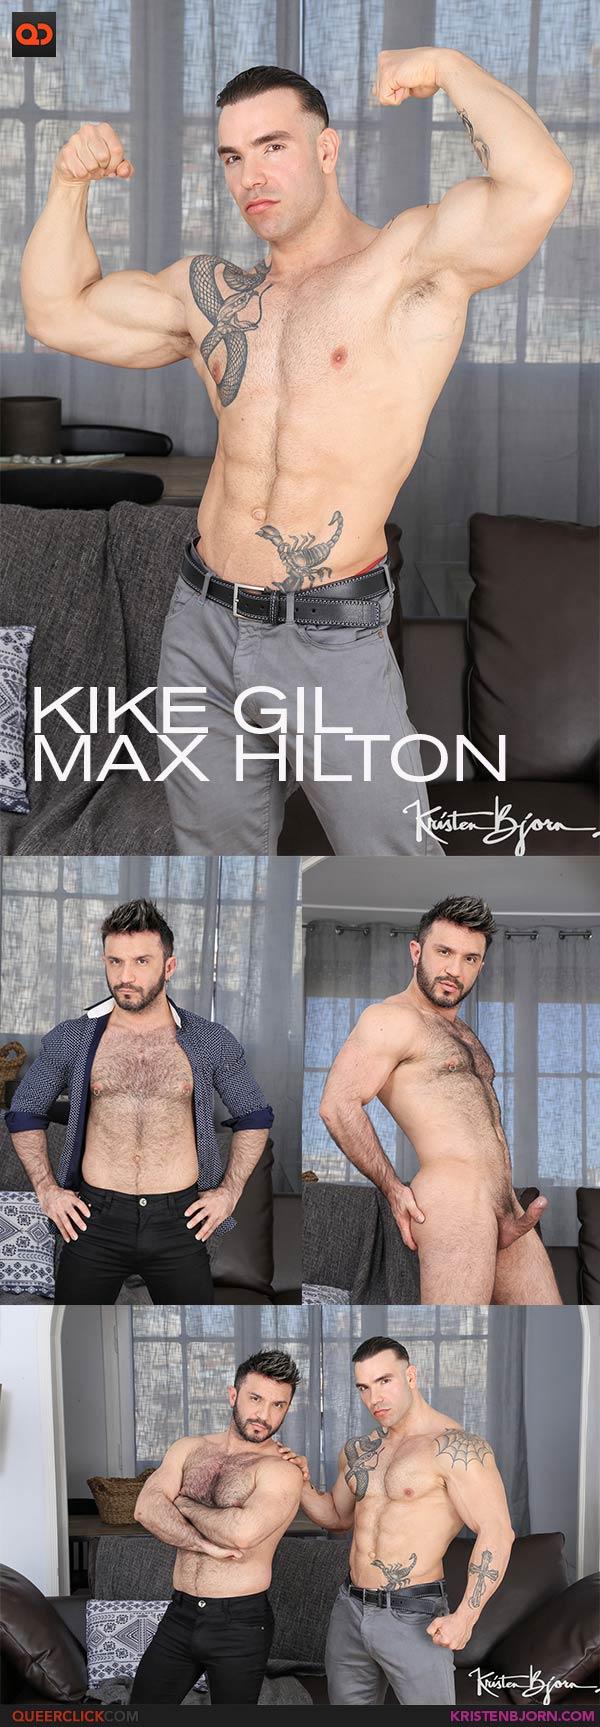 Mucho Macho - Max Hilton and Kike Gil Cover